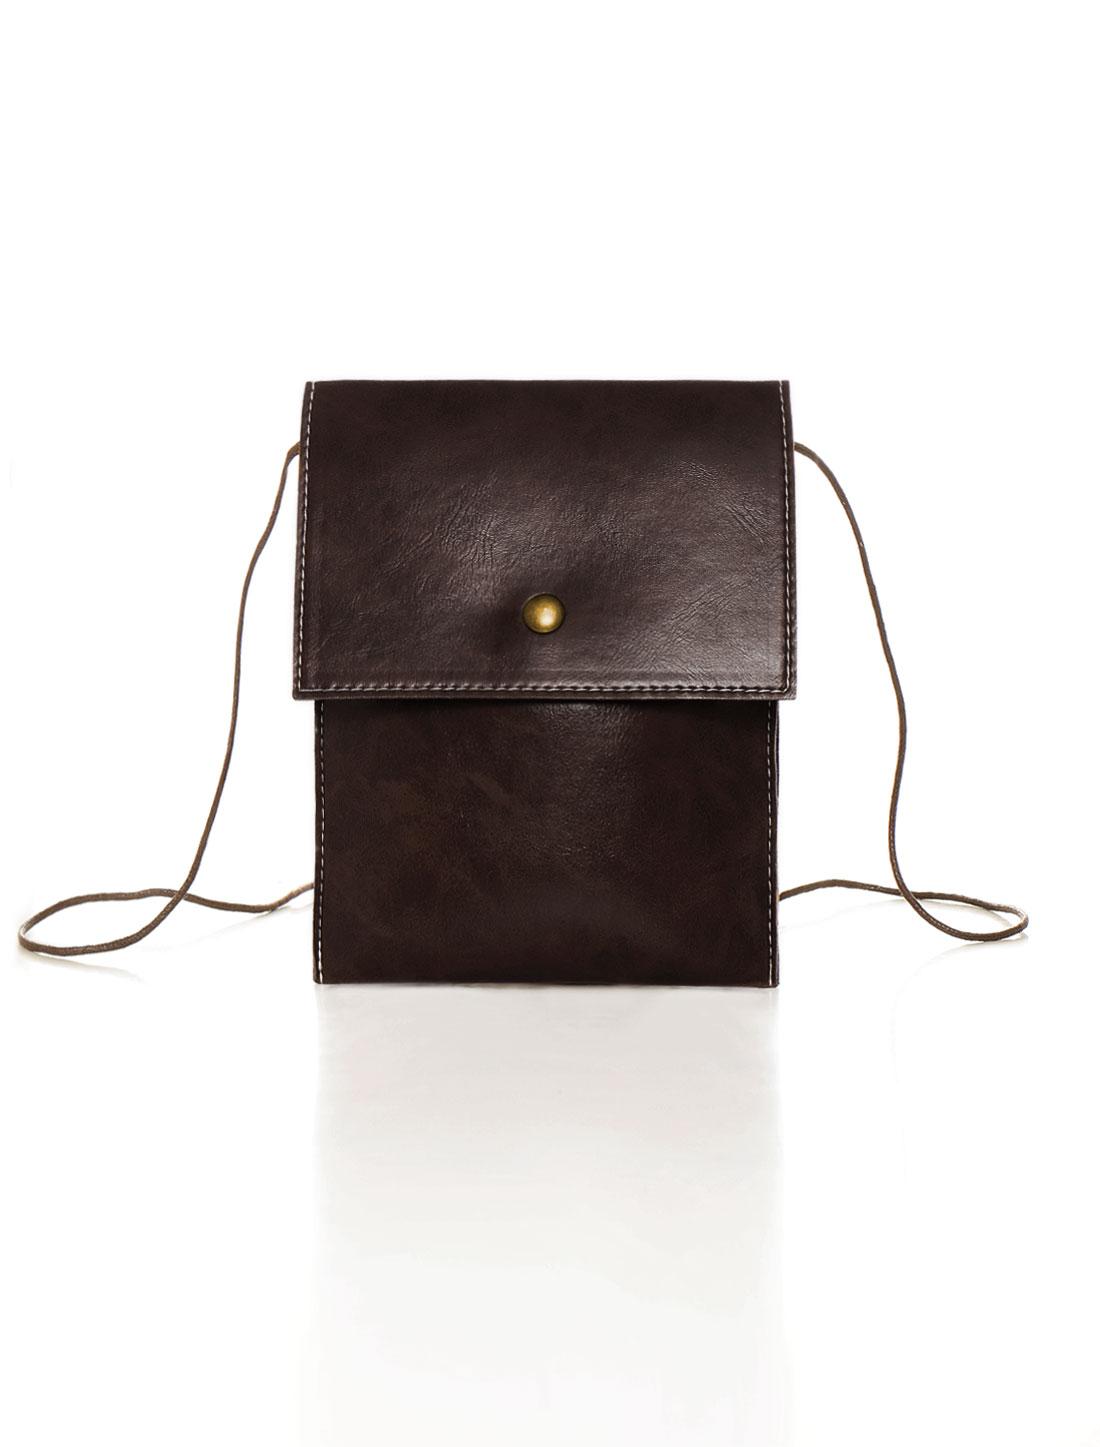 Women Unadjustable Strap Snap-magnetic Closure Crossbody Bag Brown